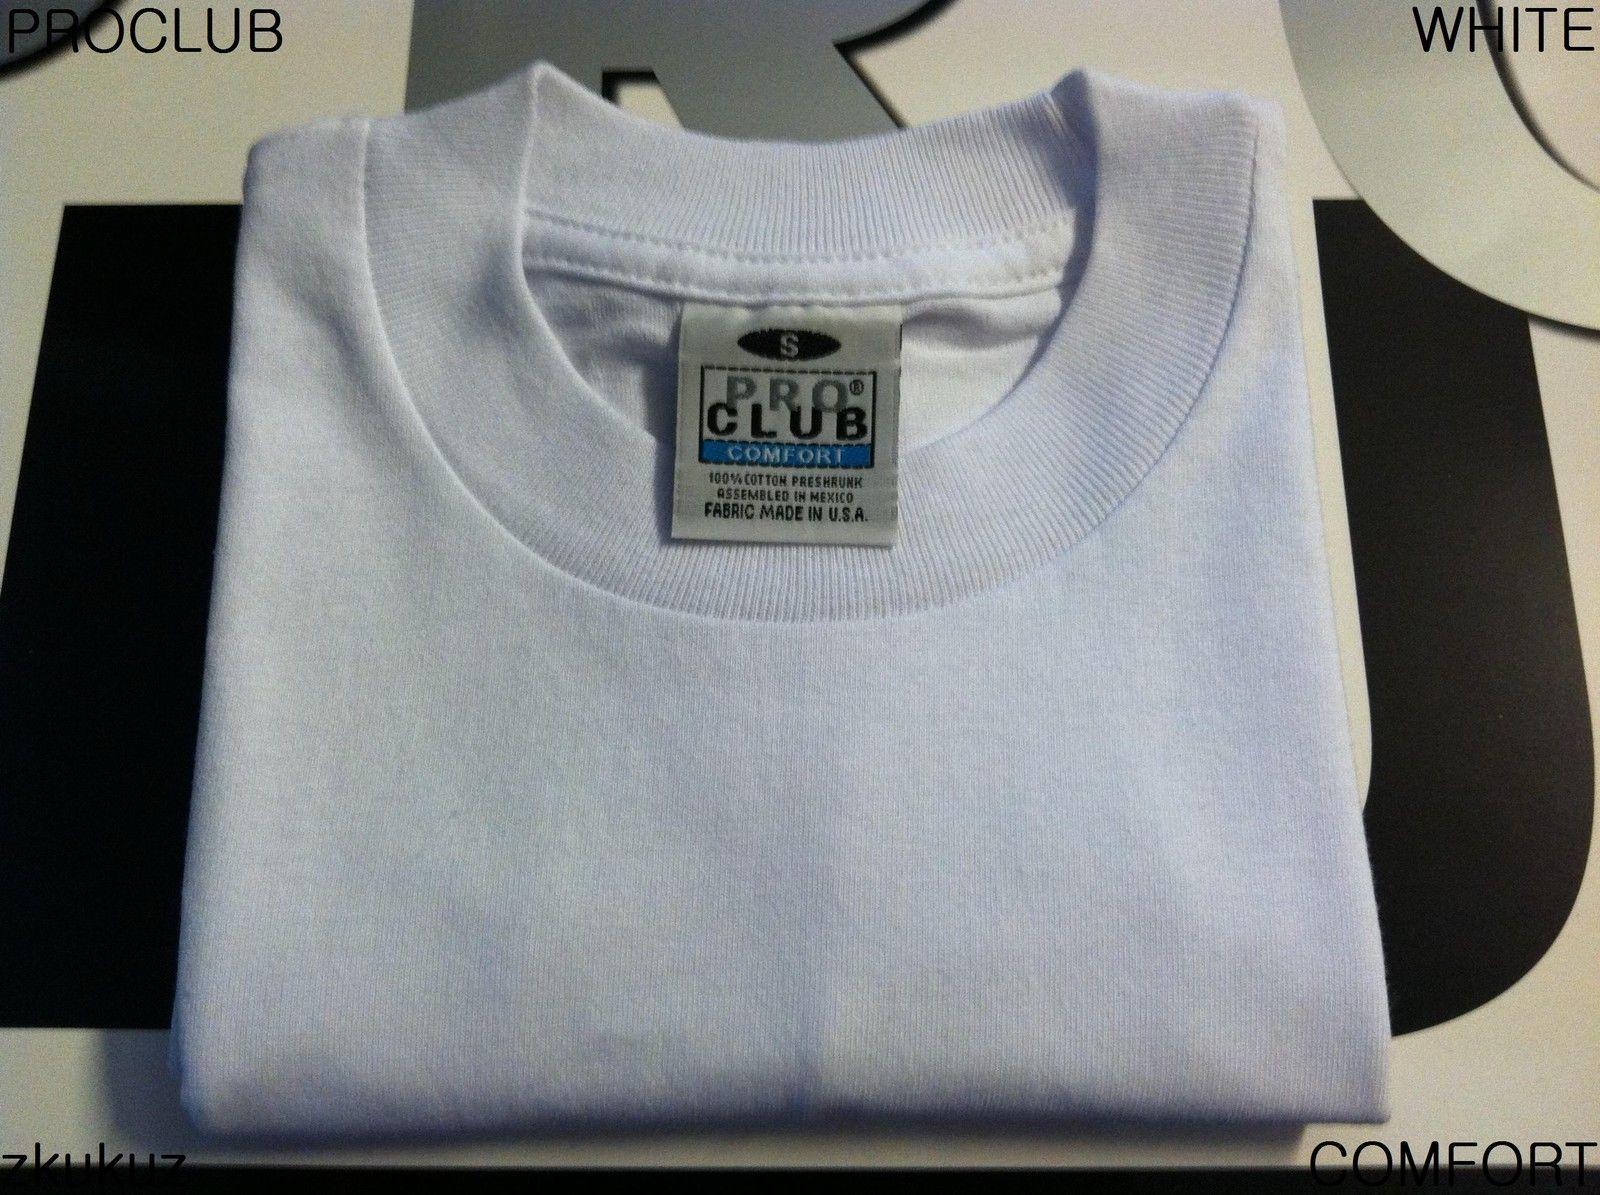 3 NEW PROCLUB HEAVY WEIGHT T-SHIRT WHITE PLAIN PRO CLUB BLANK S-3XLT 3PC